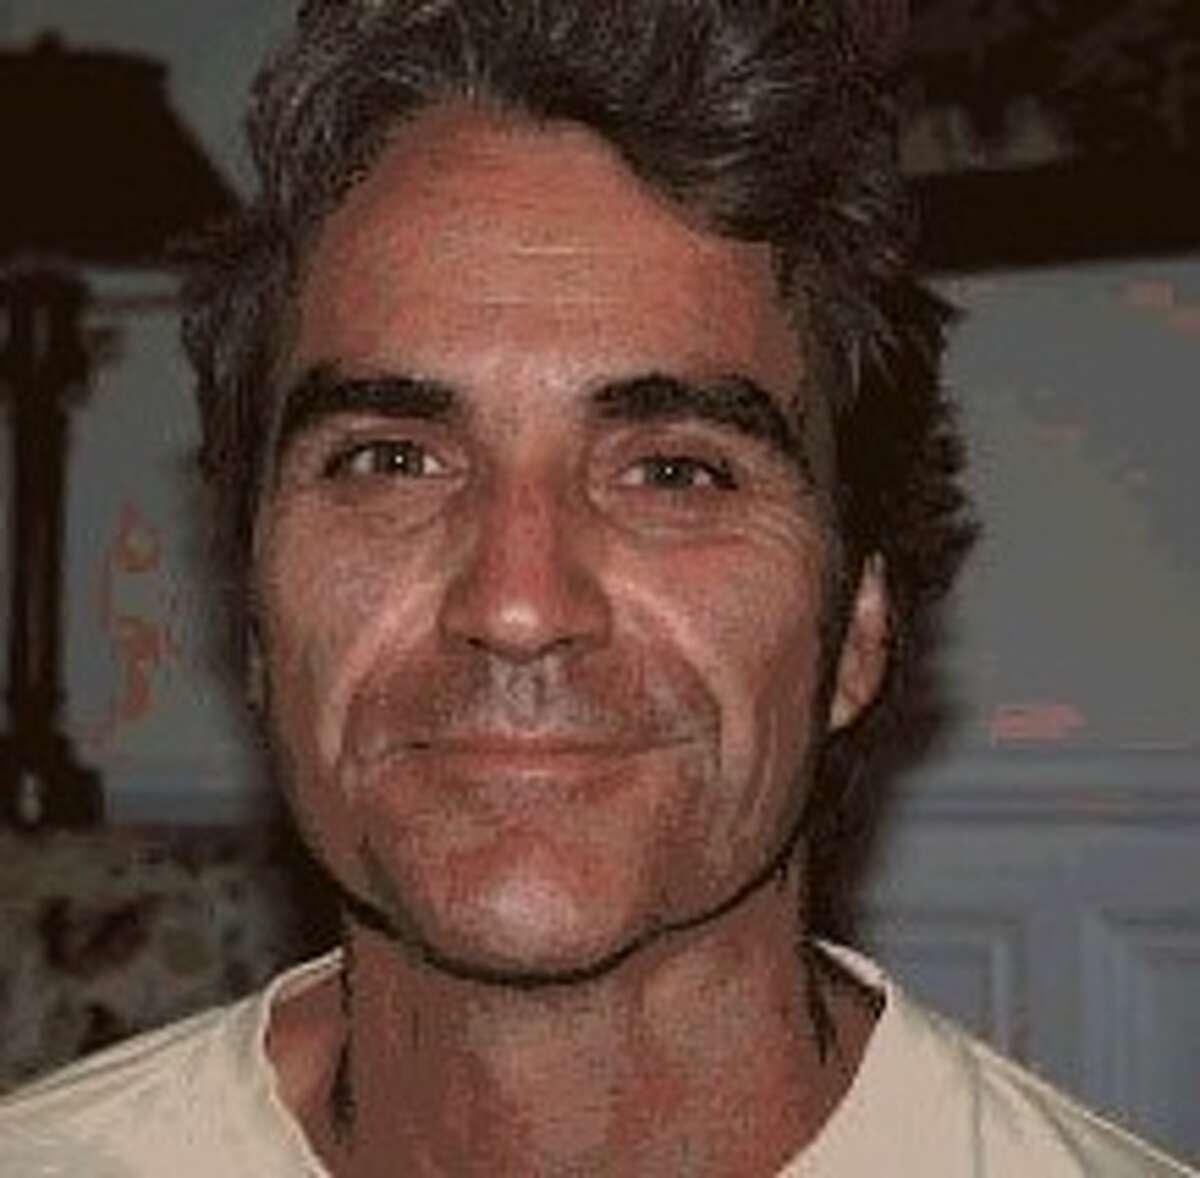 Tom Junod, a 1980 UAlbany graduate and acclaimed magazine writer for Esquire (Photo courtesy of UAlbany)